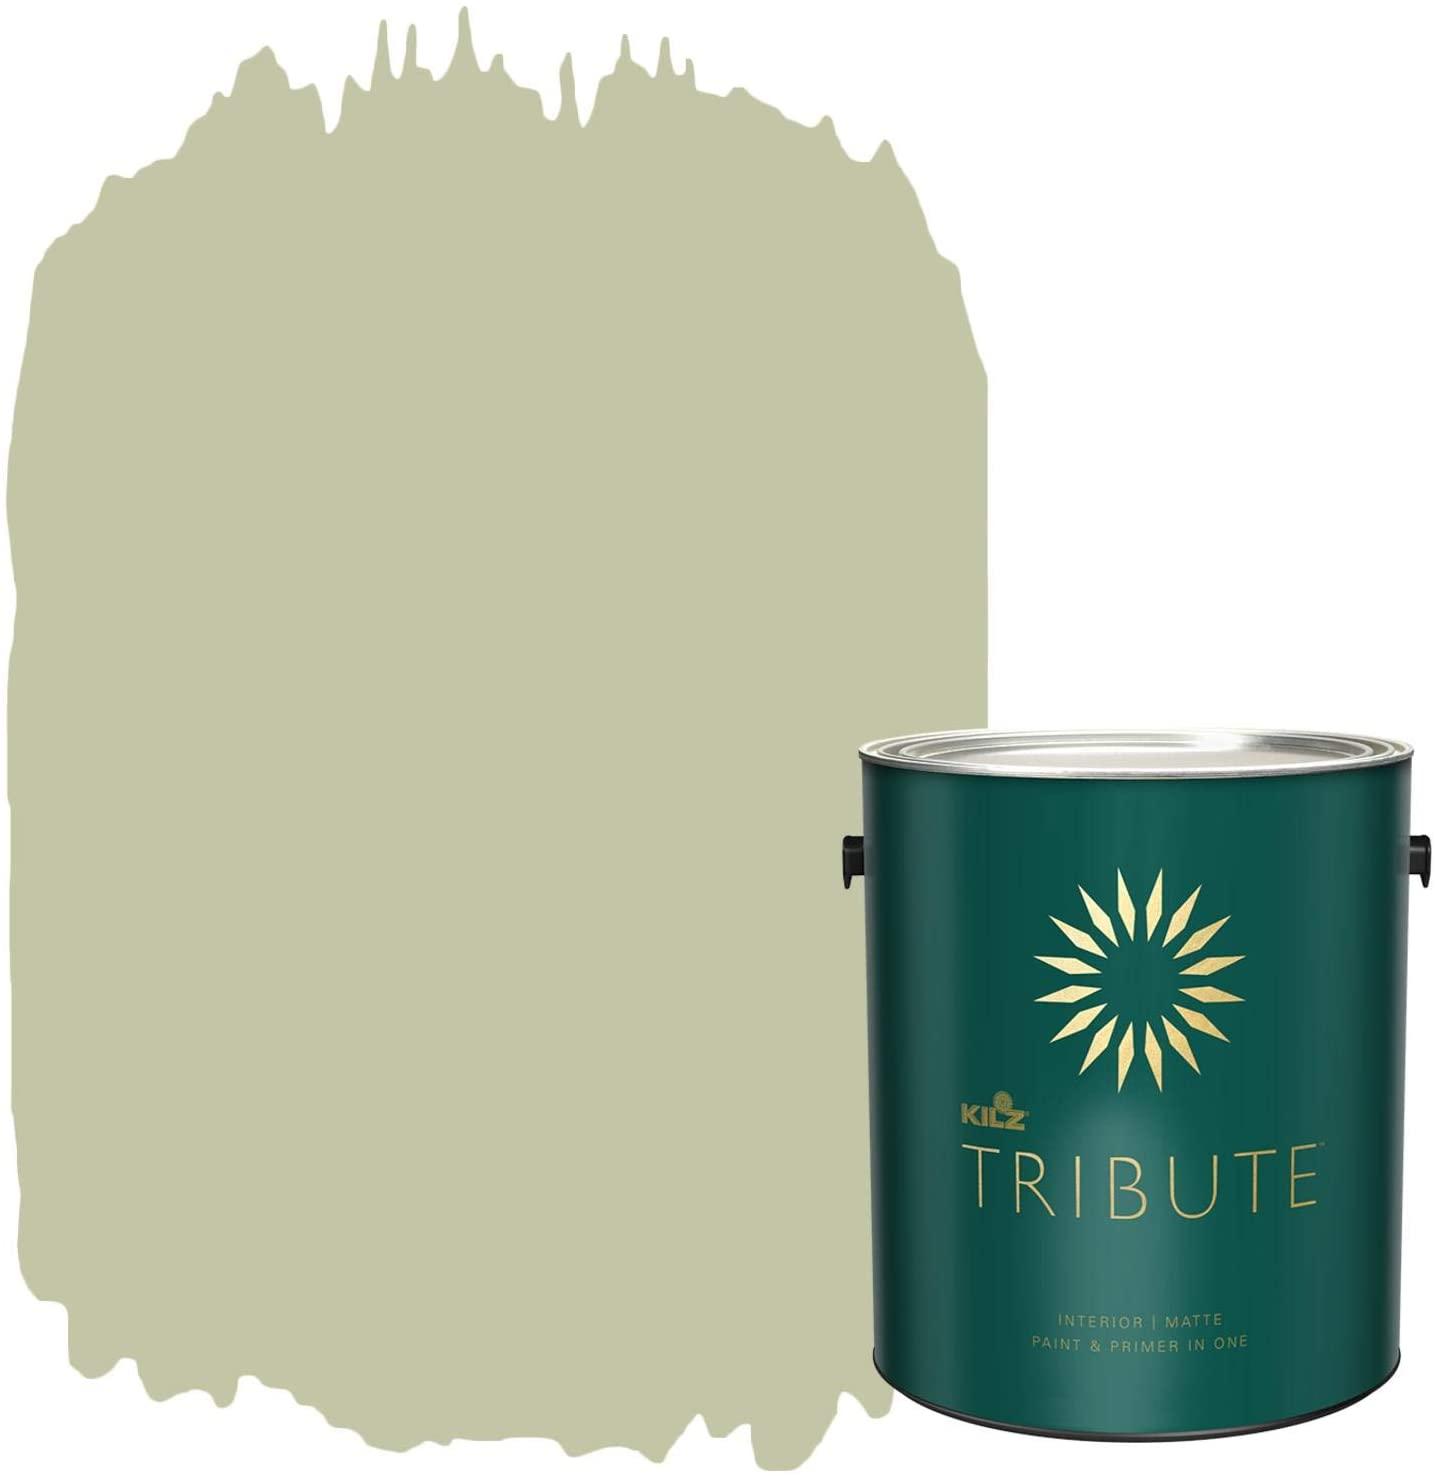 KILZ TRIBUTE Interior Matte Paint and Primer in One, 1 Gallon, Subtle Celery (TB-74)